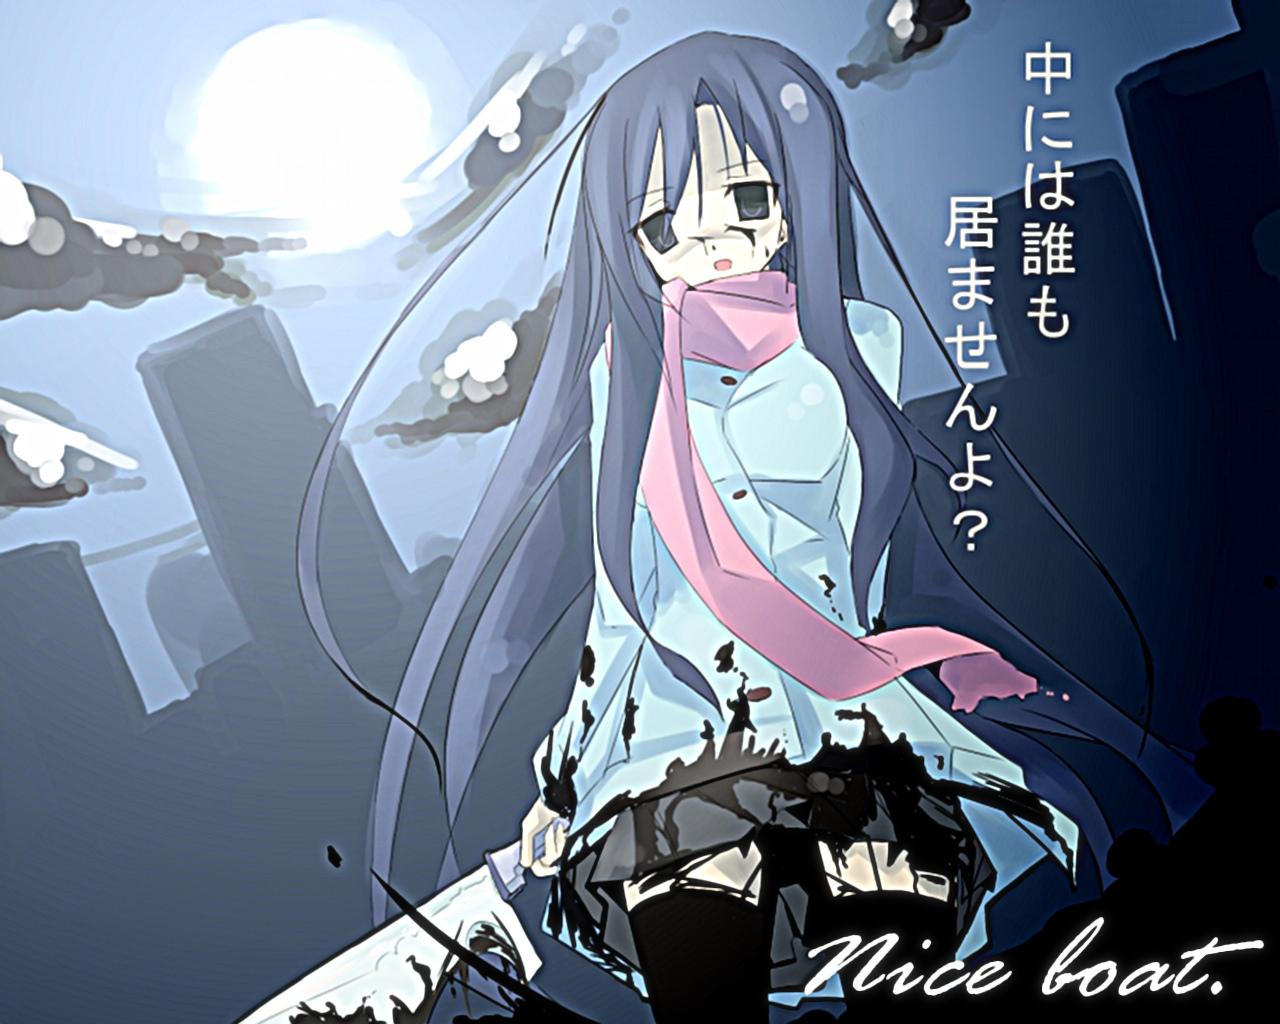 blood katsura kotonoha moon scarf school days sword thighhighs 1280x1024